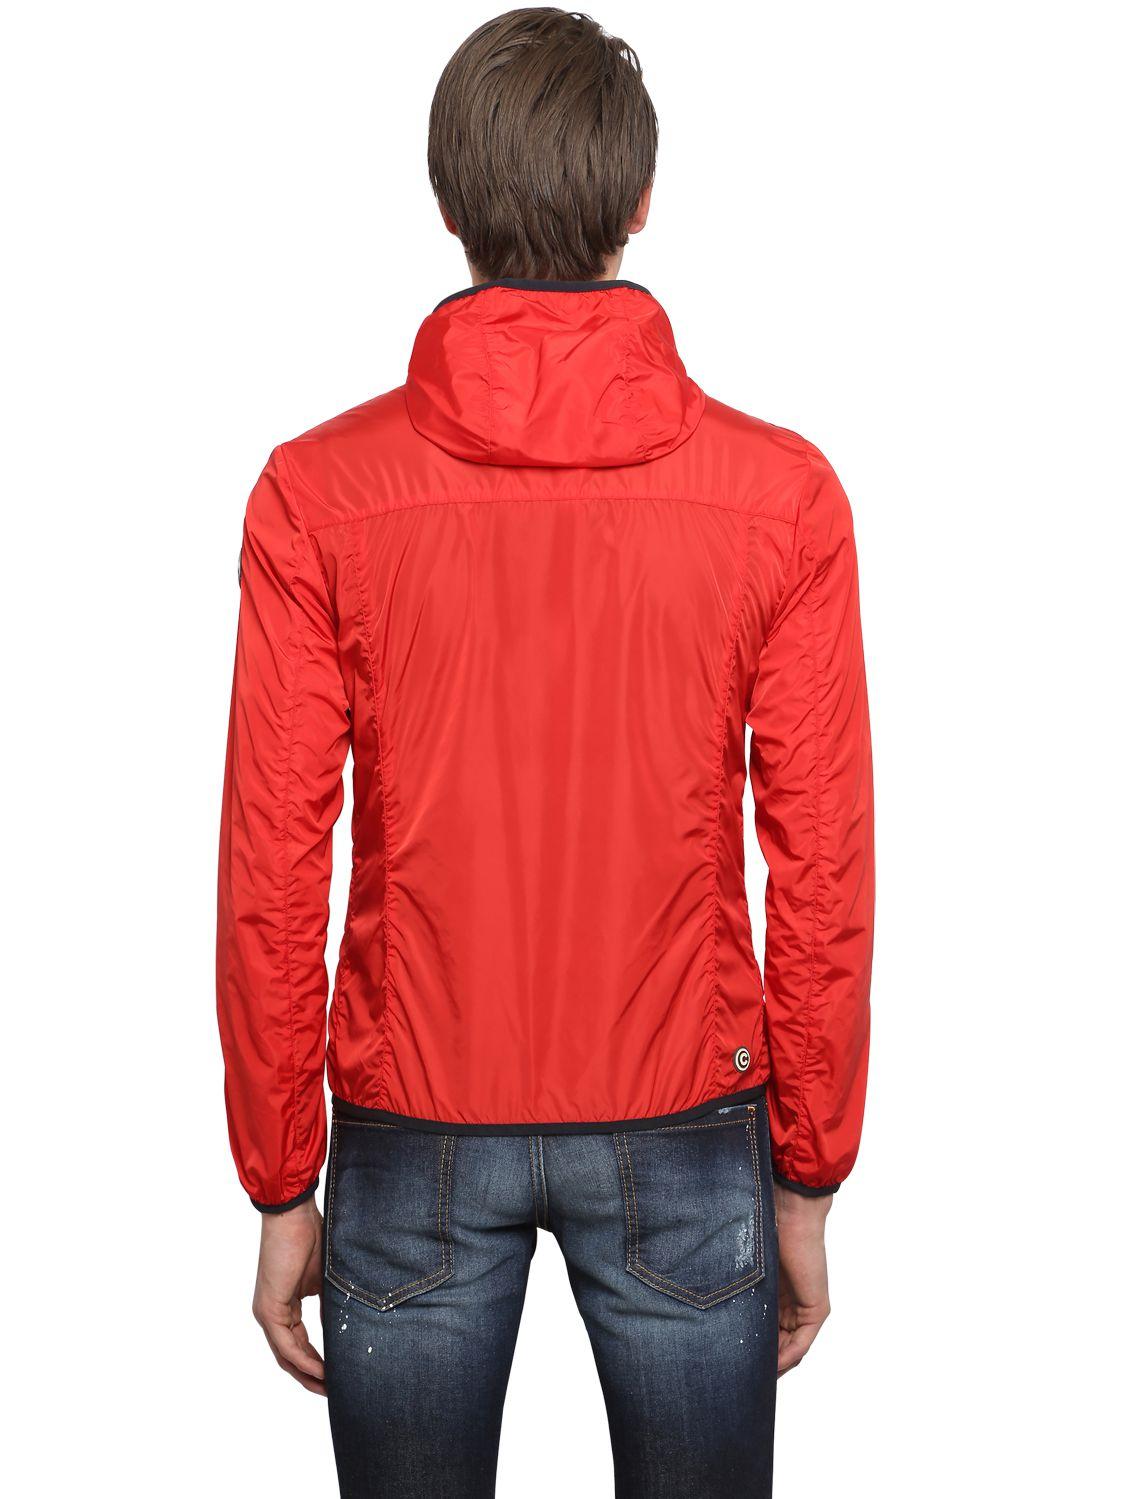 Red Nylon Windbreaker 28